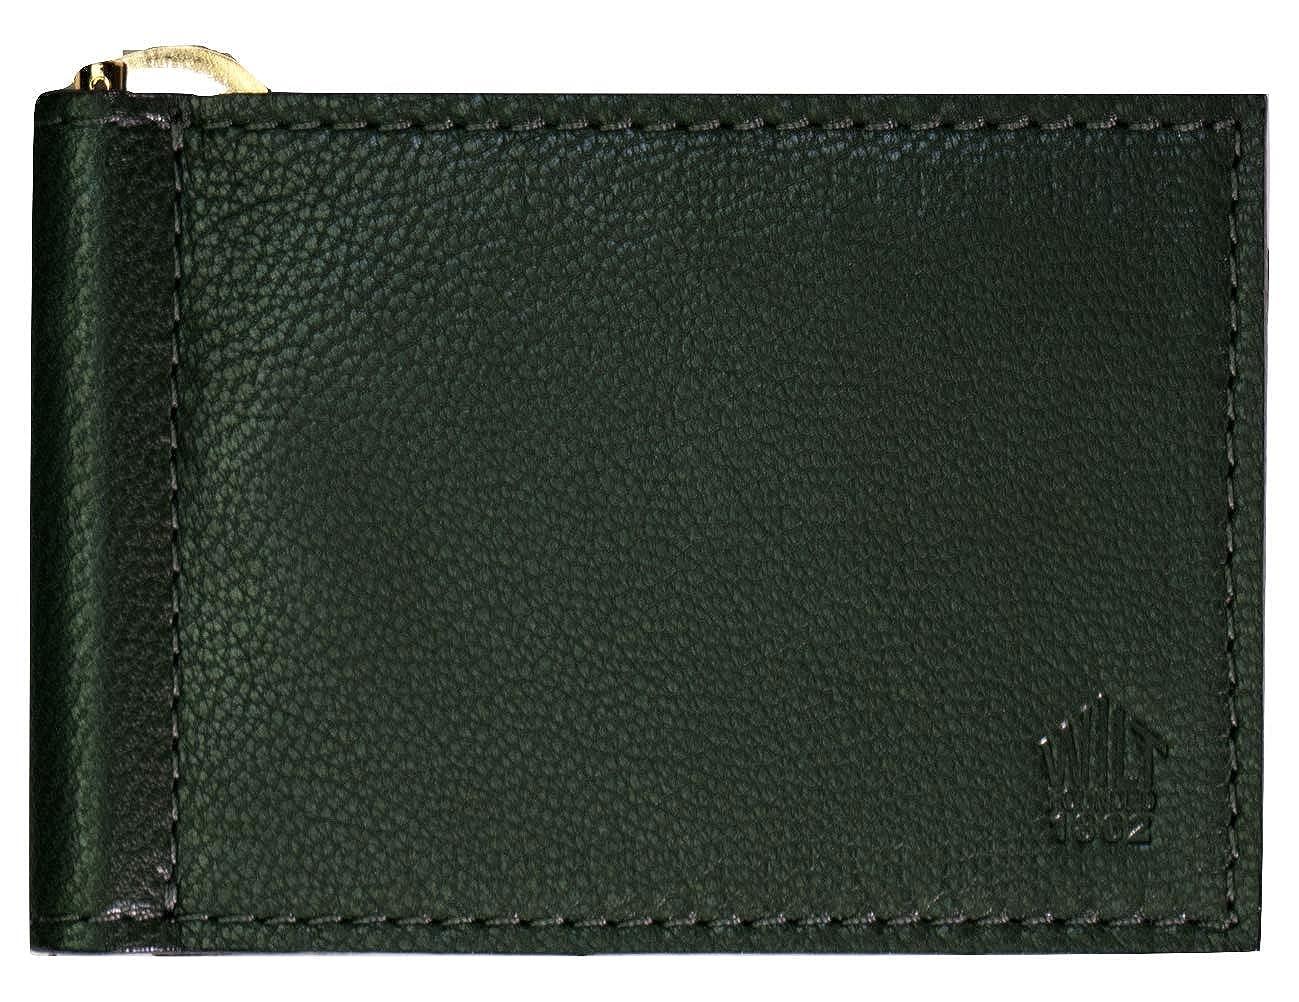 Wilt 1862 Hunter Green Wabash Leather Money Clip Card Wallet